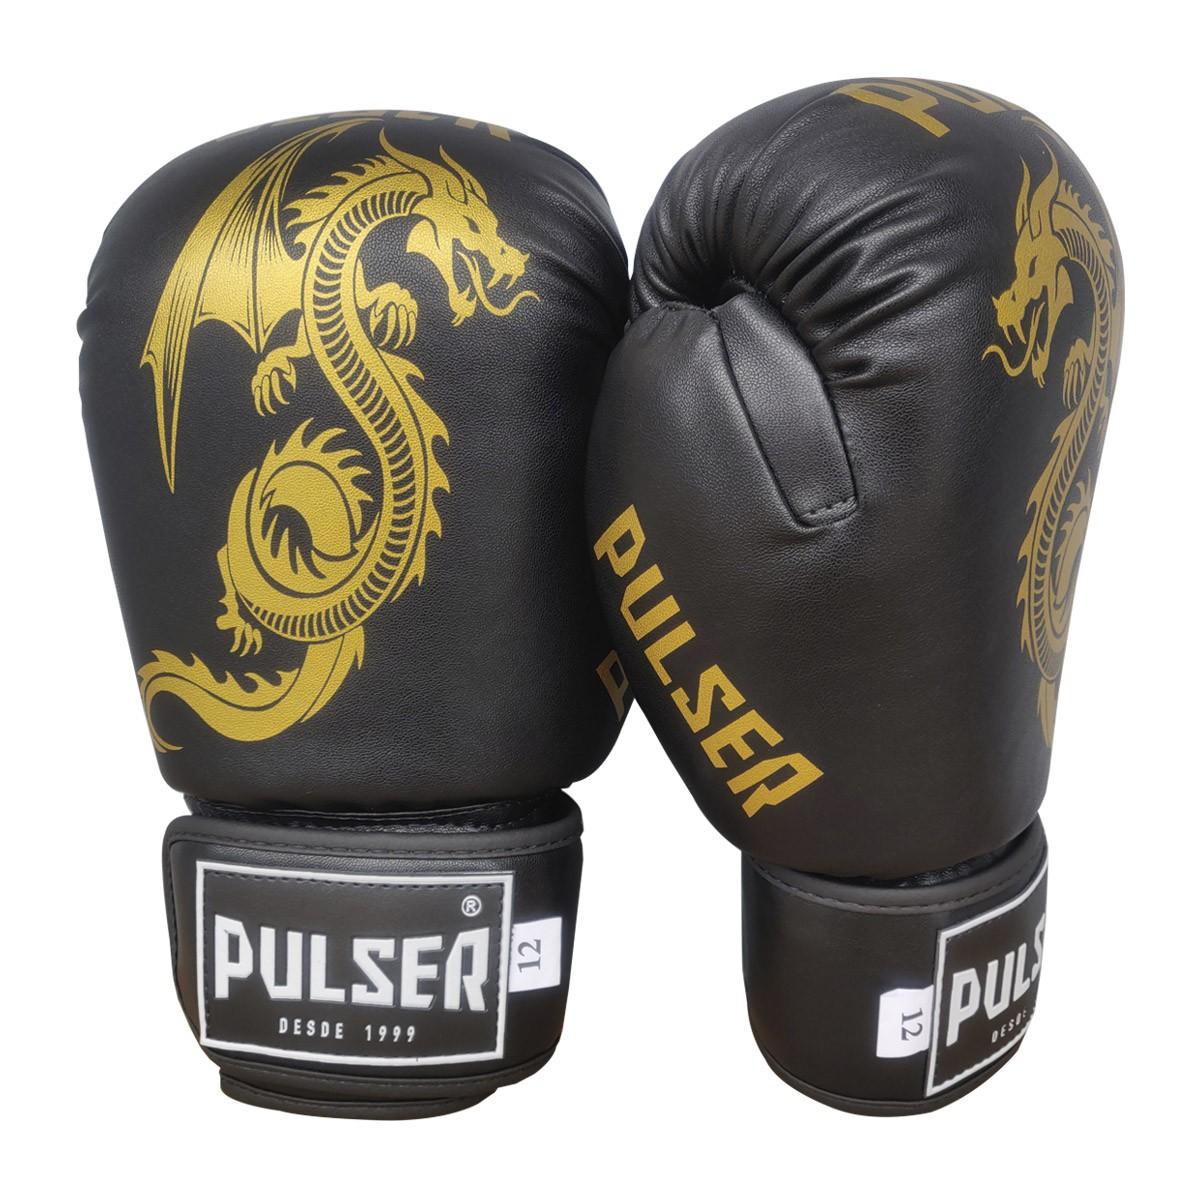 Kit Luva de Boxe / Muay Thai 12oz + Bandagem 3 Metros + Bucal Simples - Pulser  - PRALUTA SHOP